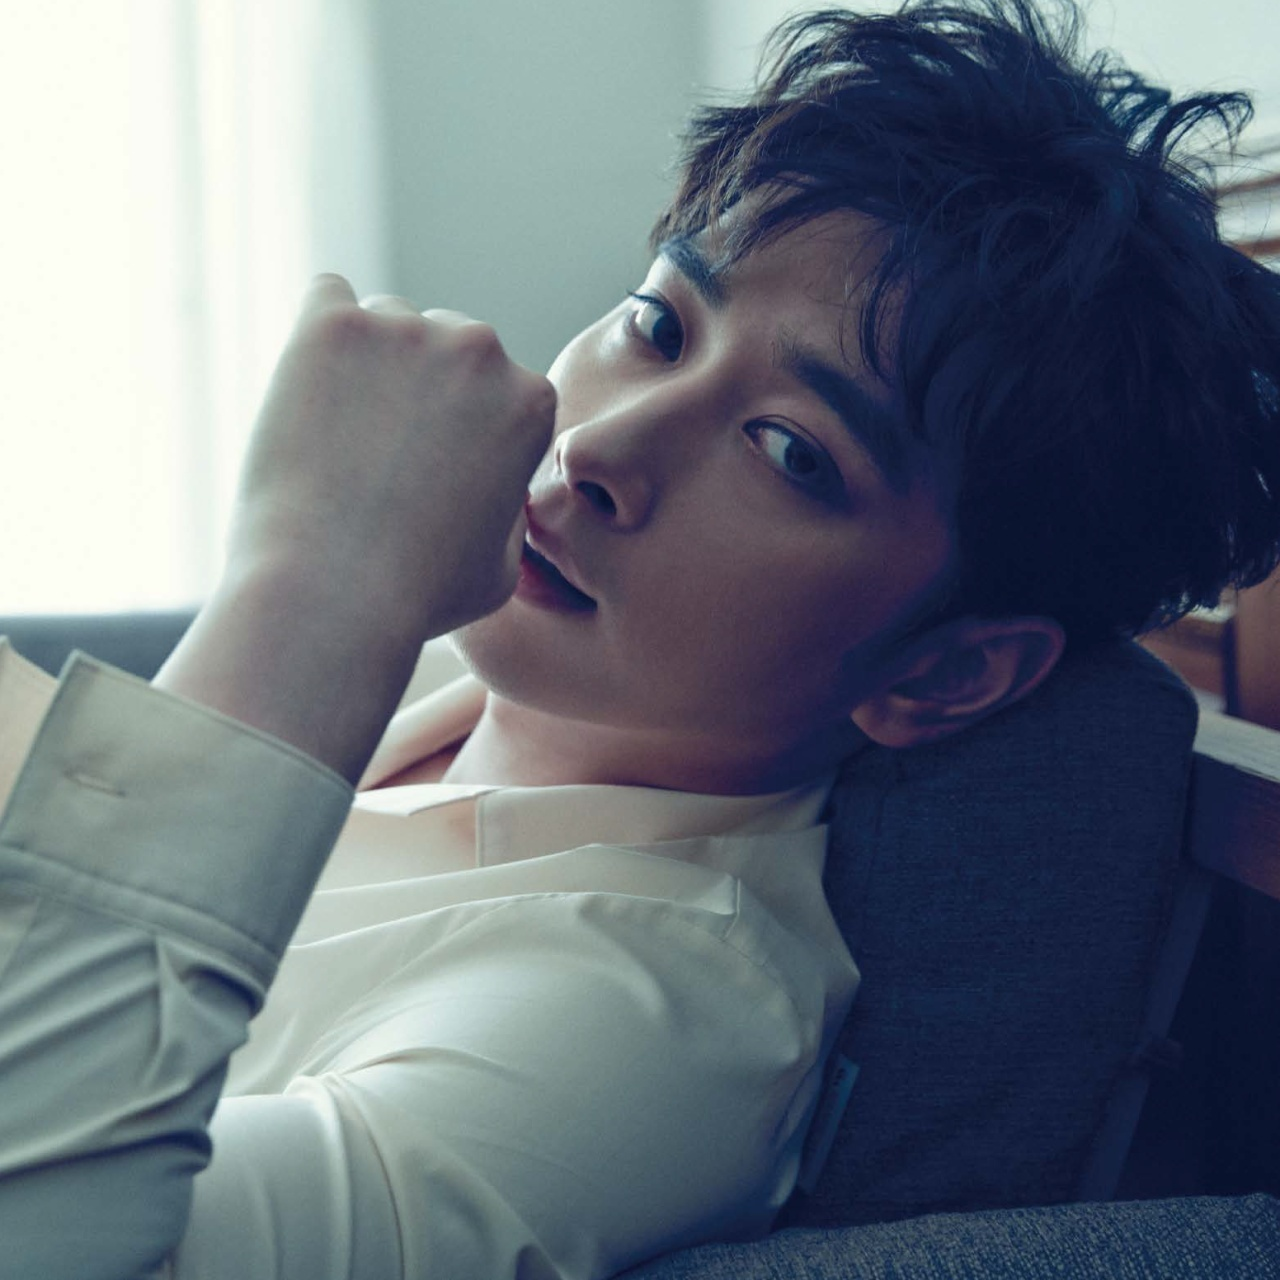 Hwang Chansung 2pm Asiachan Kpop Image Board